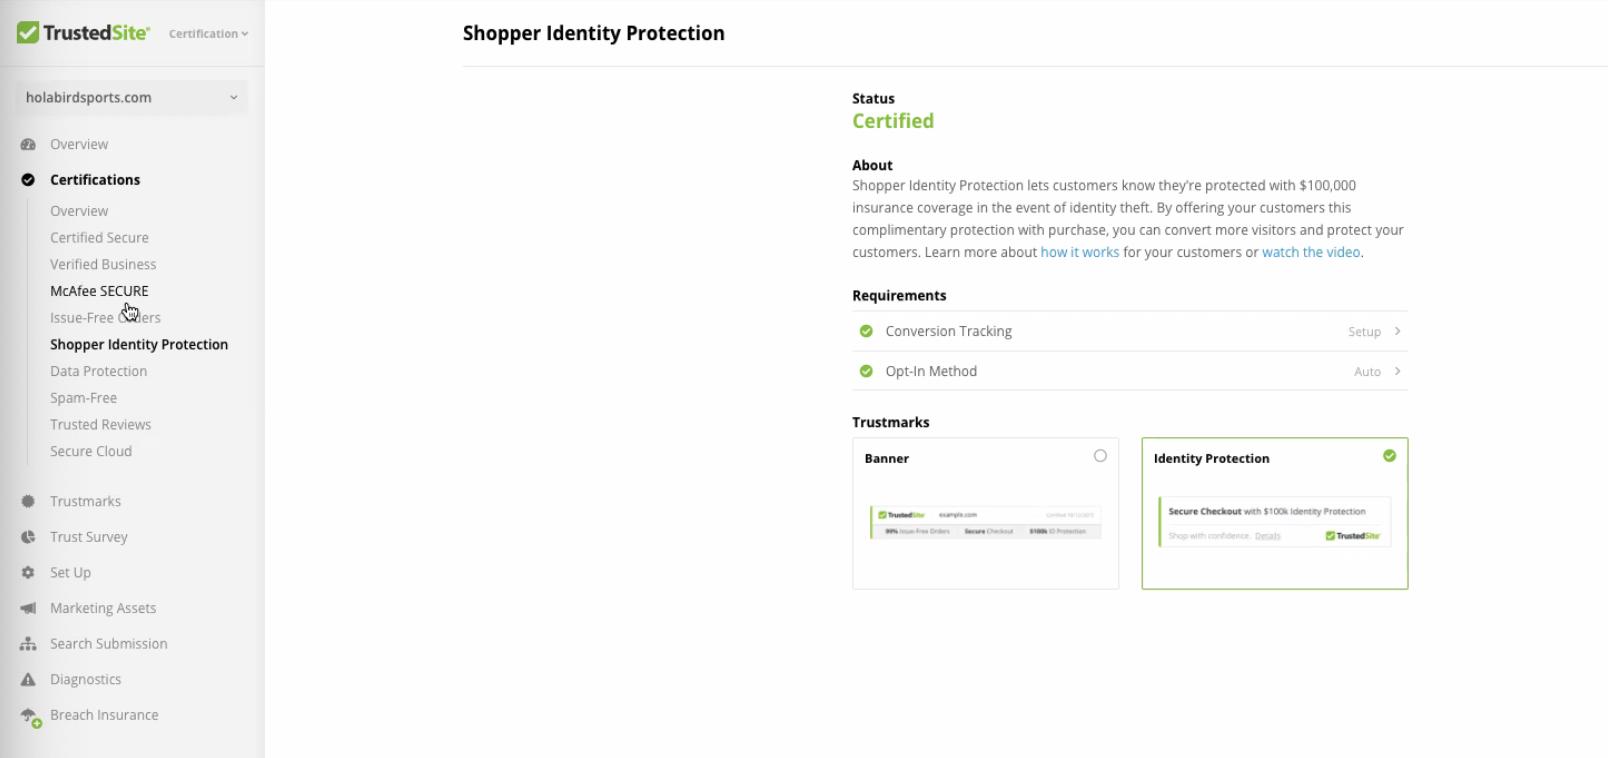 TrustedSite shopper identity protection